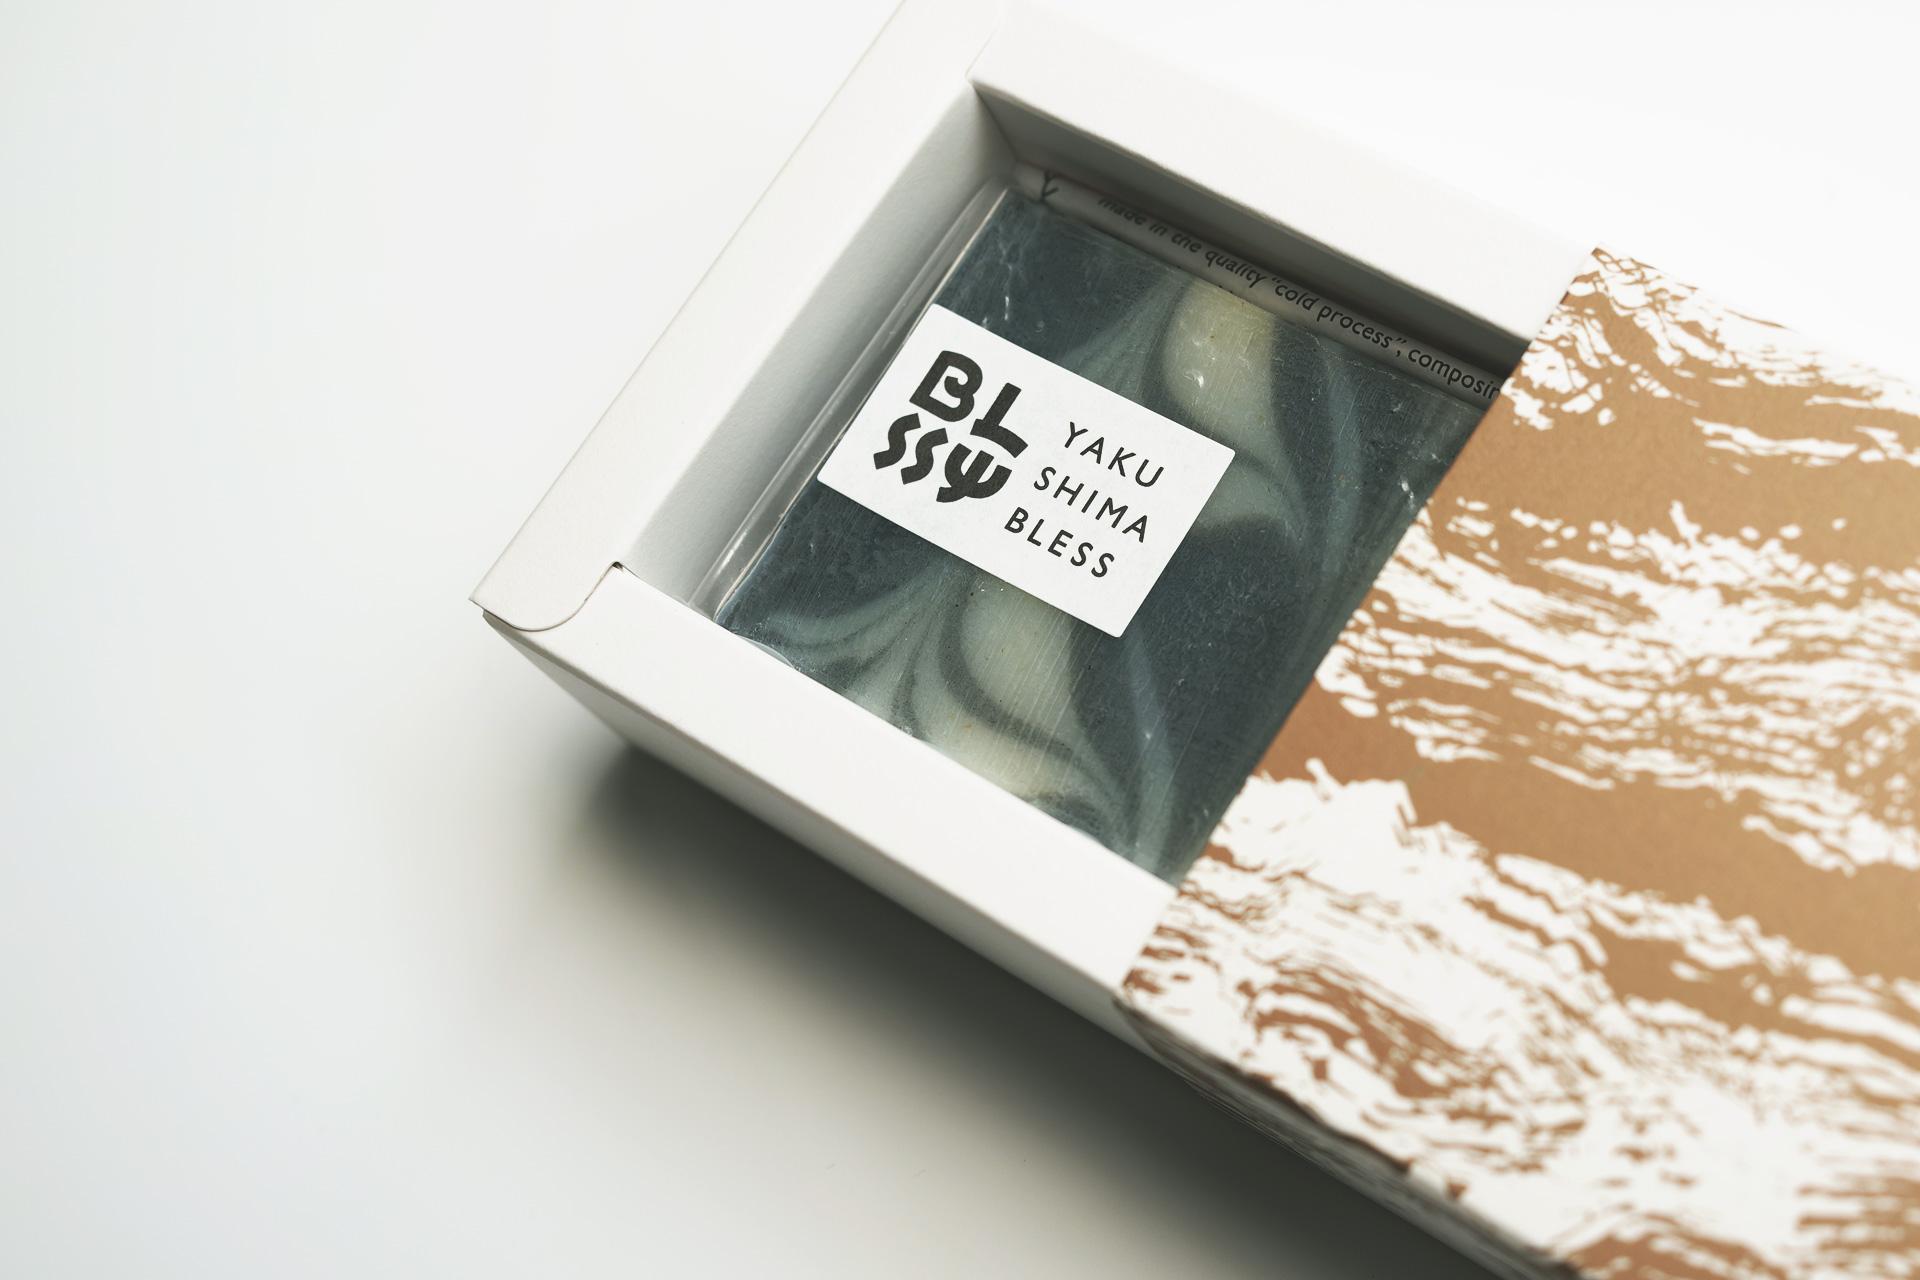 YAKUSHIMA BLESS クスノキと竹炭の石鹸・パッケージ